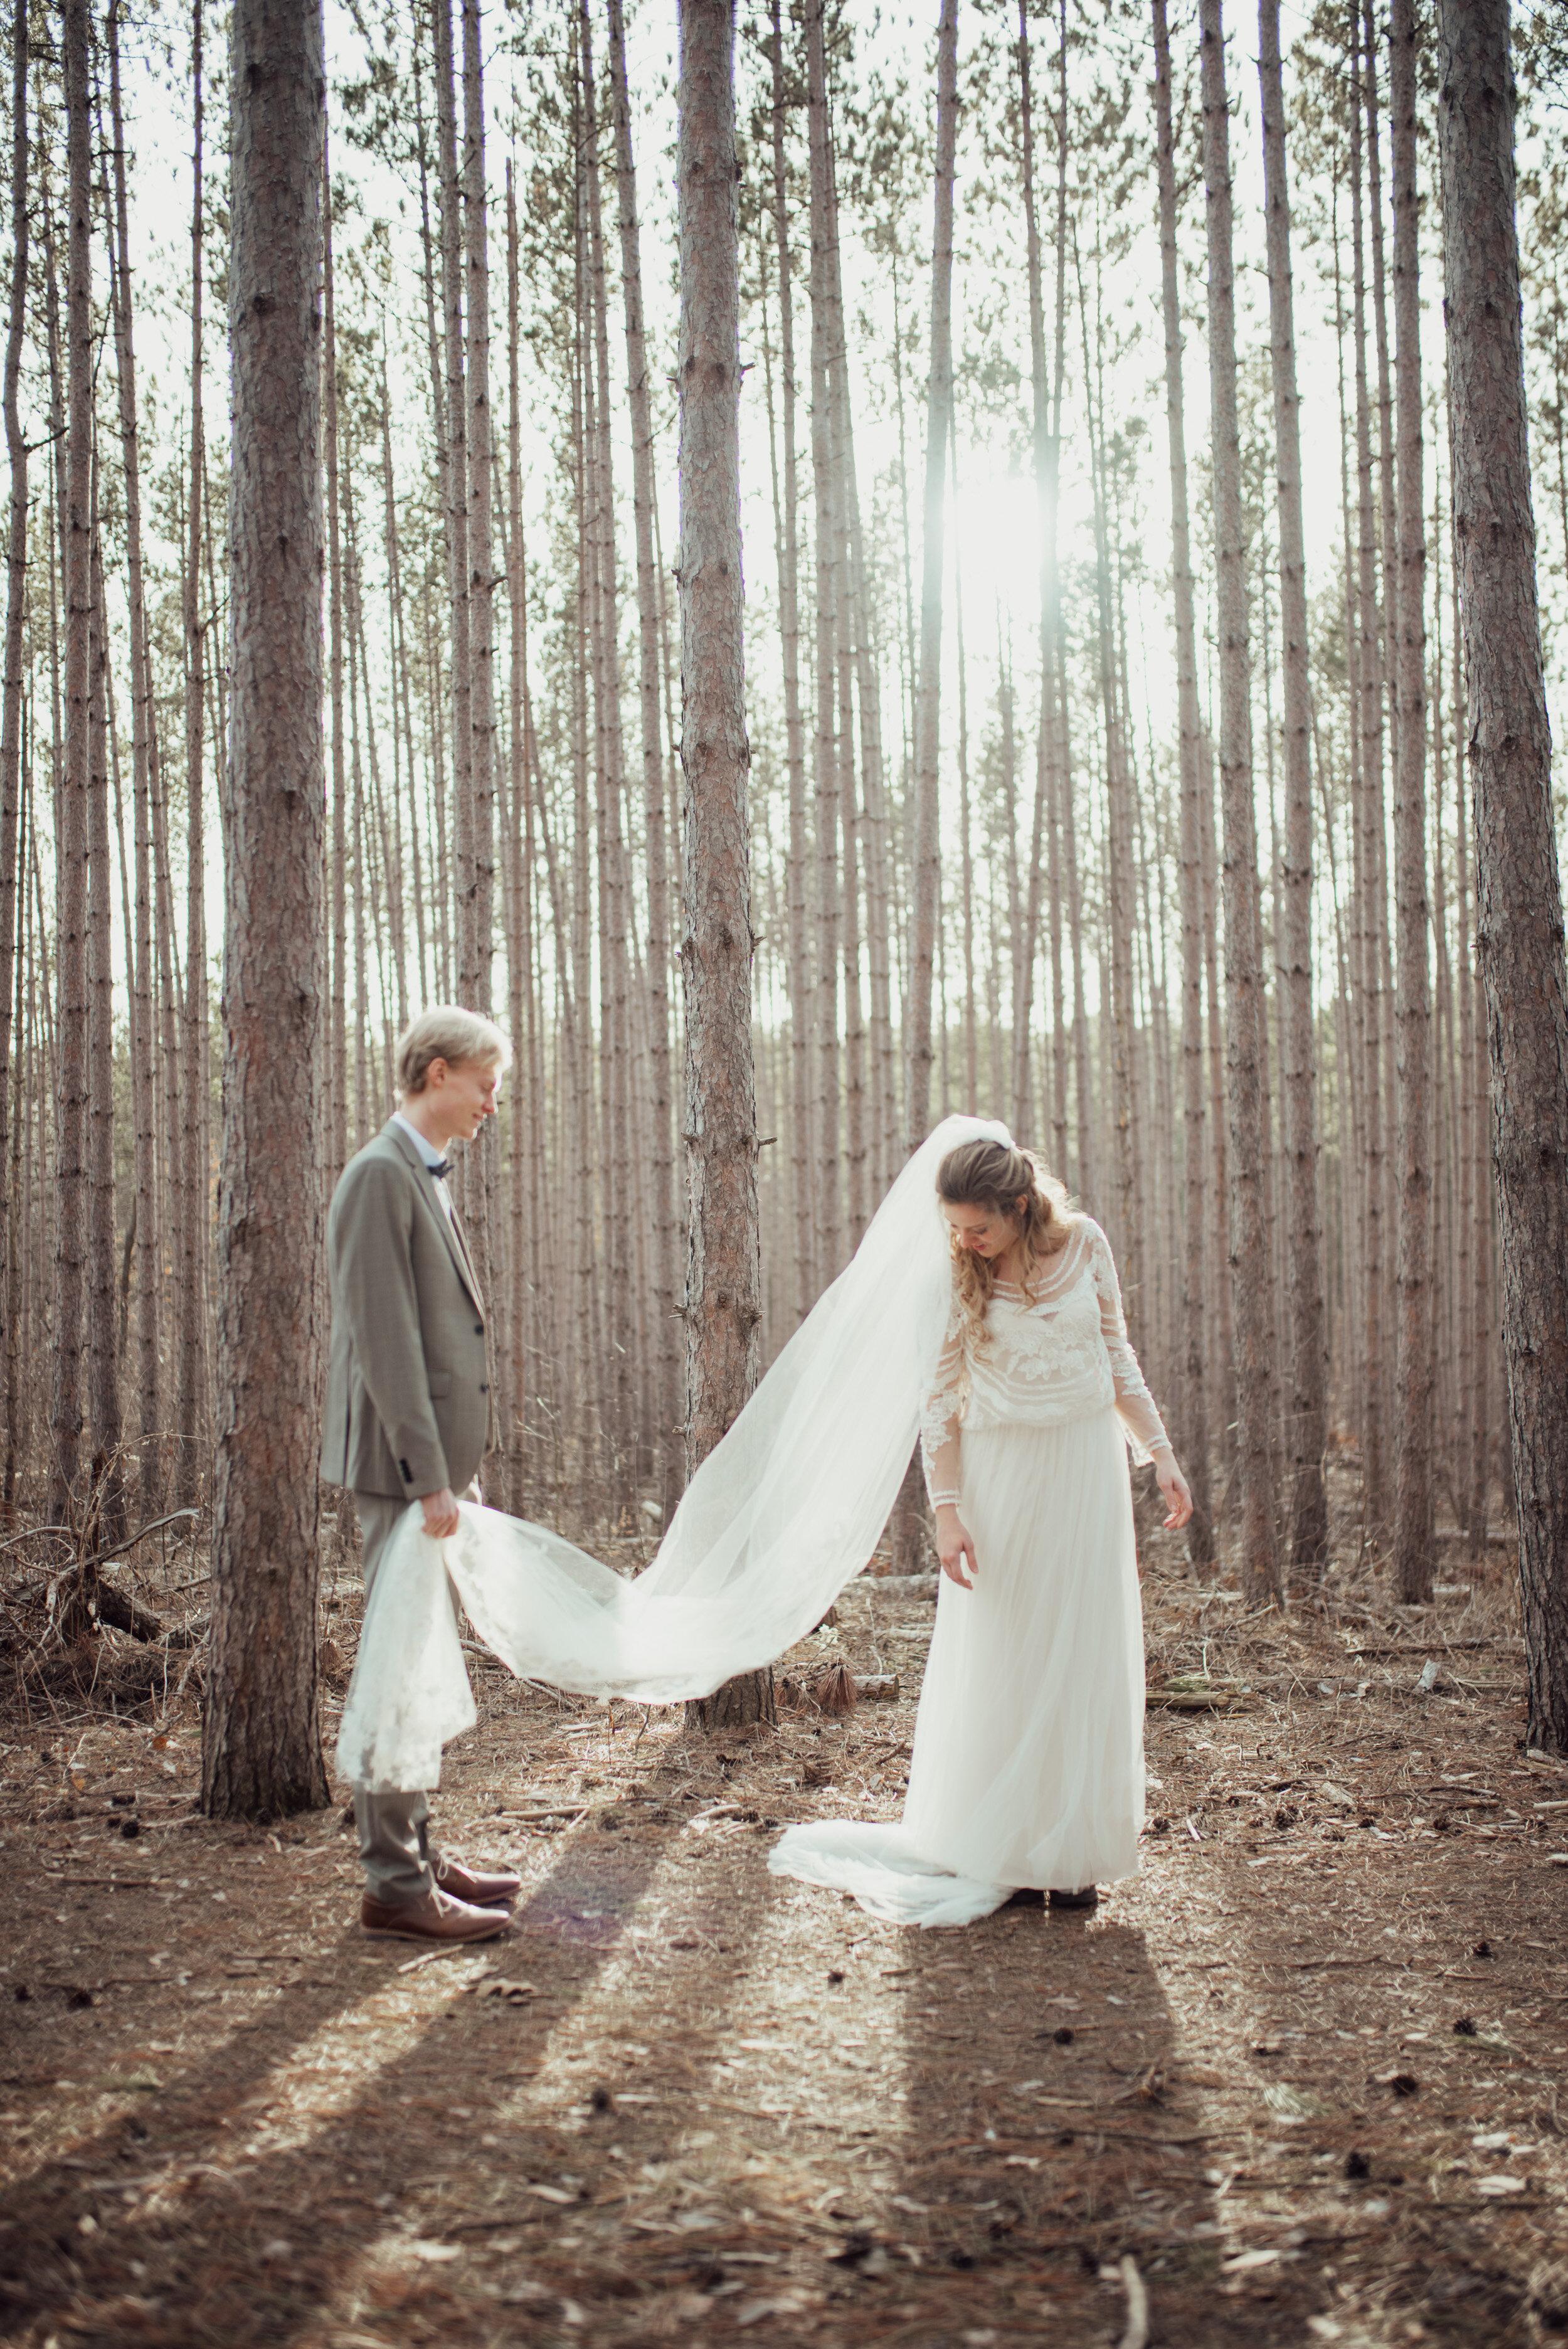 cleland-fine-art-wedding-photography-10.jpg